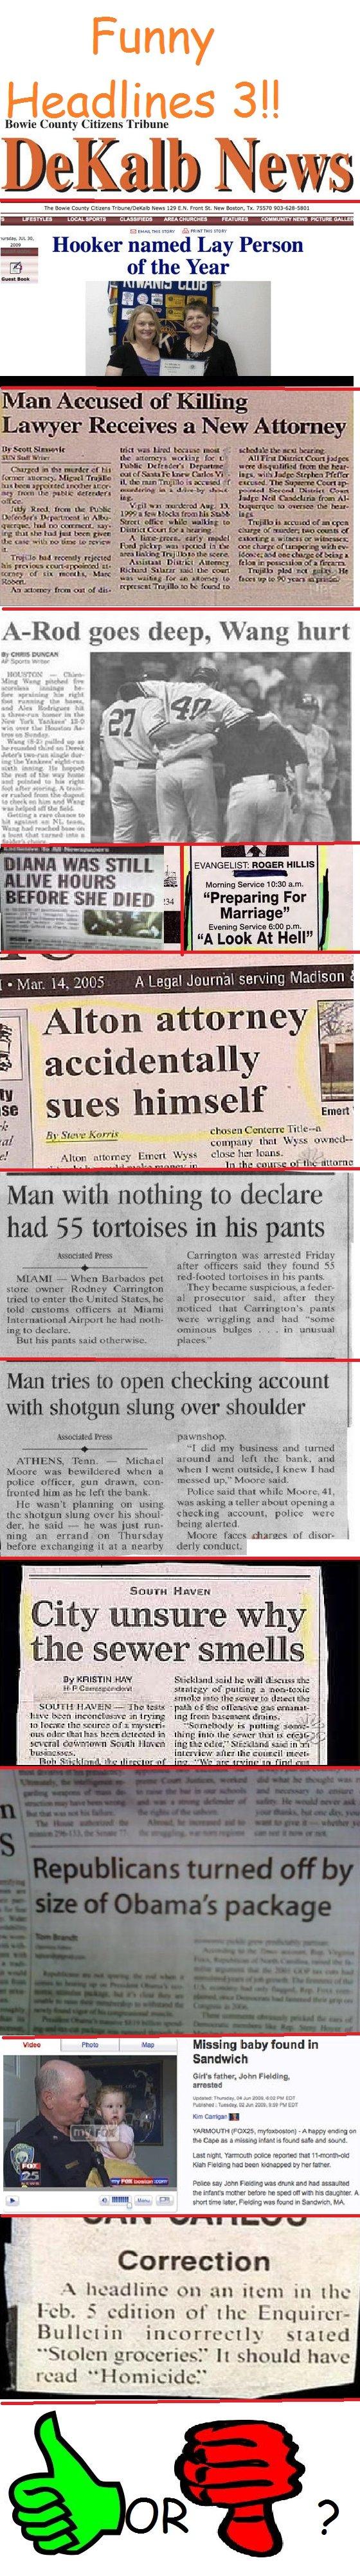 Funny Headlines 3. Original: /funny_pictures/960243/Funny+Headline... /> Part 2:<br /> /funny_pictures/961339/Funny+Headline... /> EDIT: Part 4! /fu Funny Headlines 3 Original: /funny_pictures/960243/Funny+Headline /> Part 2:<br /funny_pictures/961339/Funny+Headline EDIT: 4! /fu